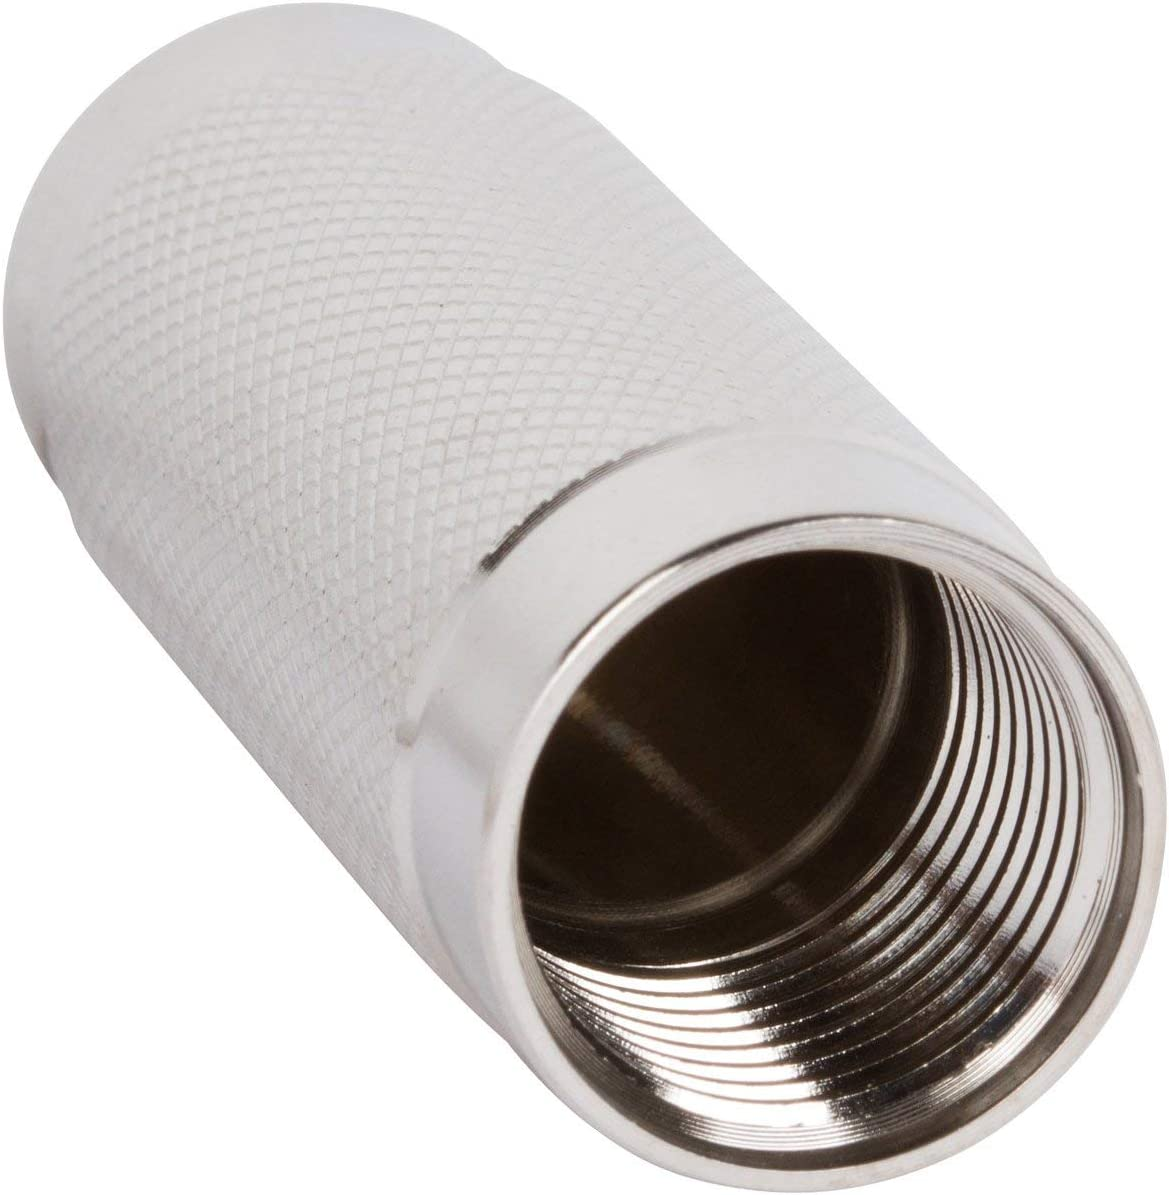 Whipped Cream Dispenser Cartridge Holder Replacement - Threaded Cap - Stainless Steel